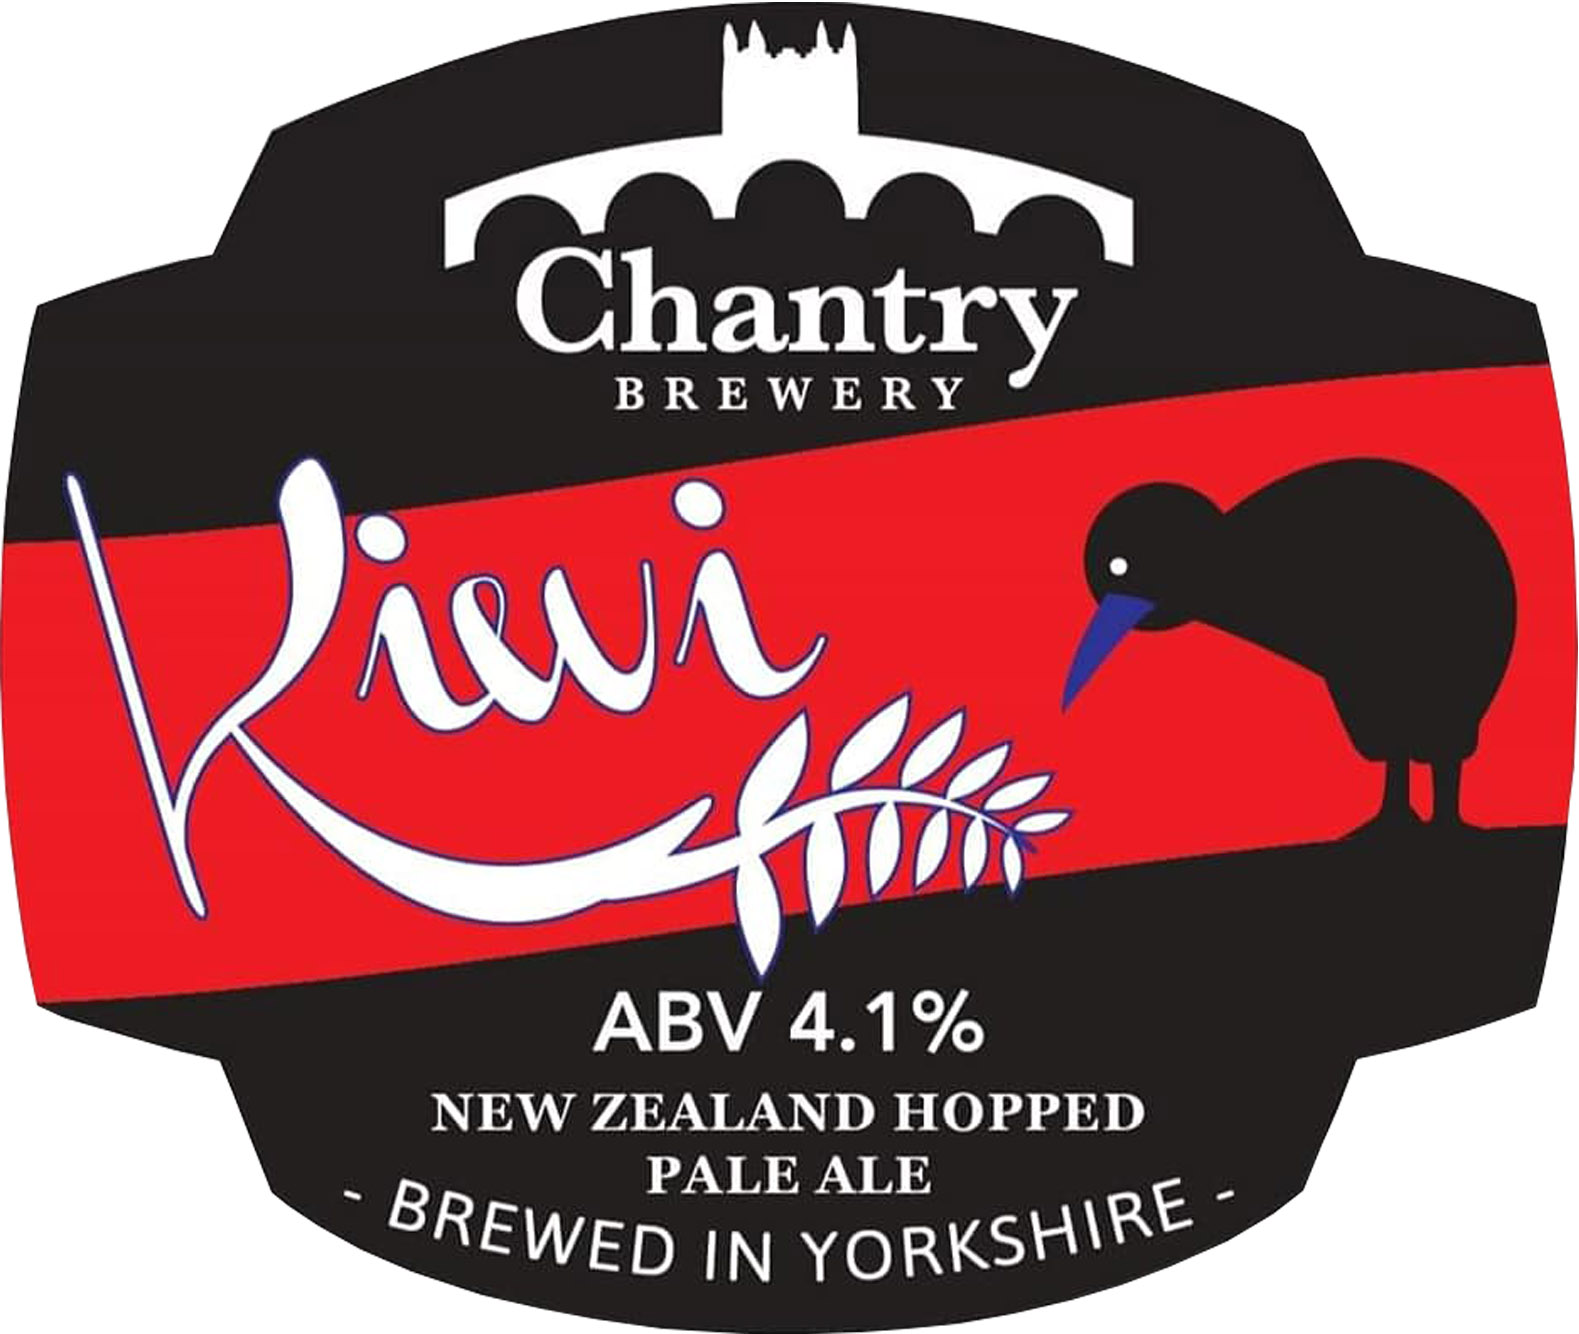 Chantry Brewery Kiwi